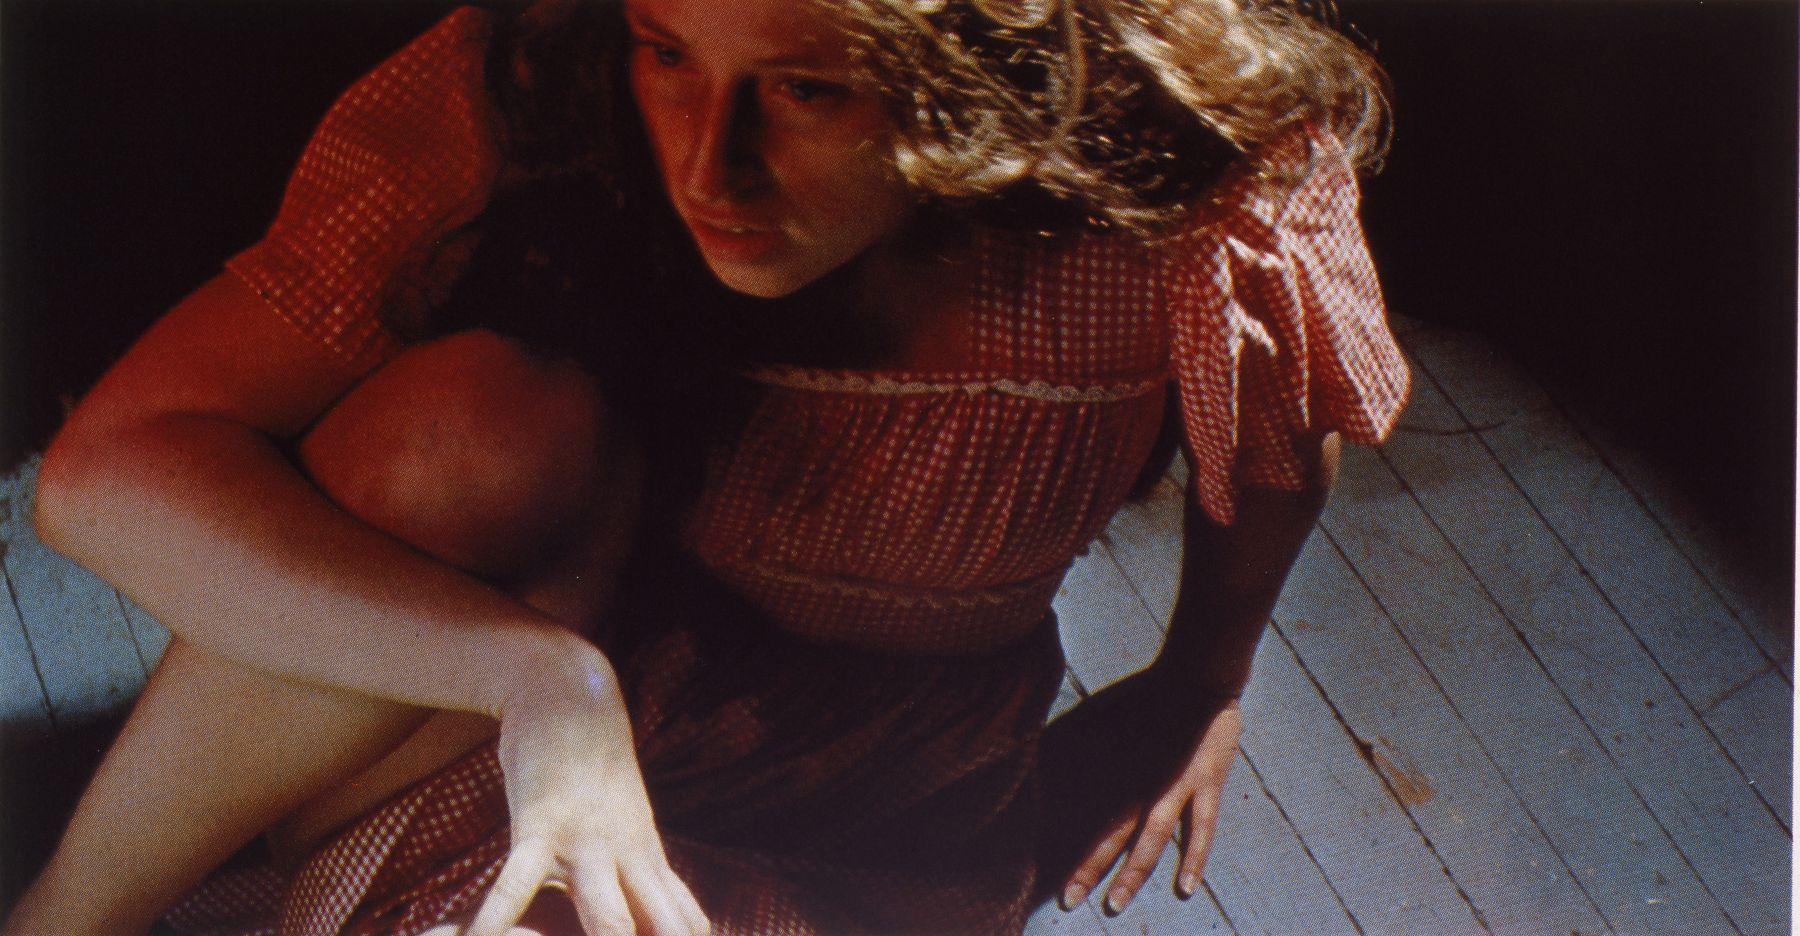 Cindy Sherman, Color Photograph, 1981